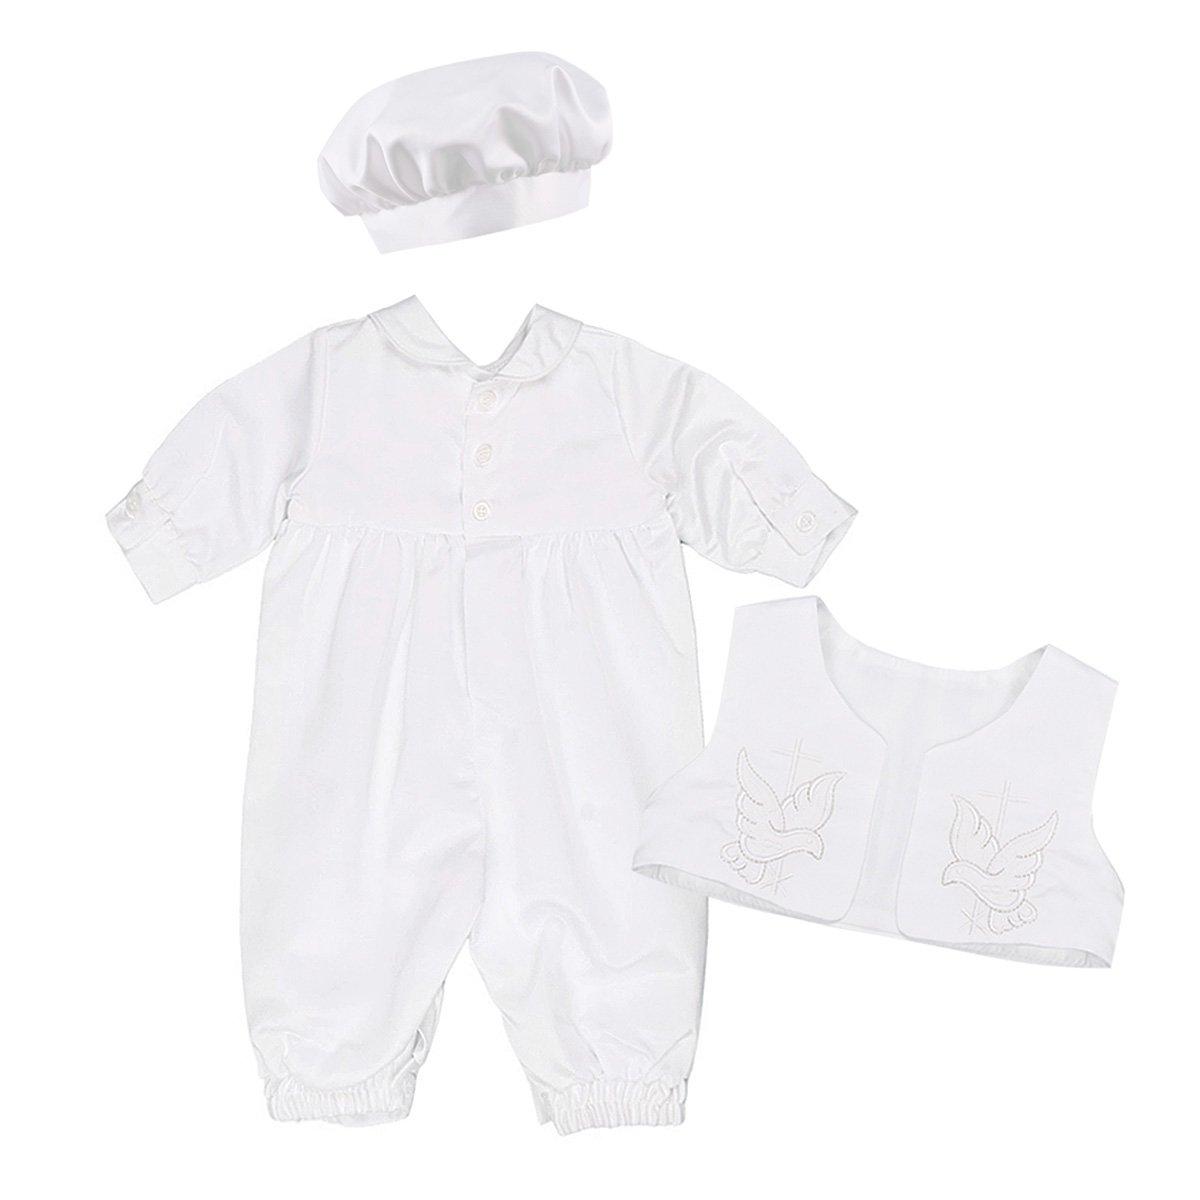 Ivory// 3-18 Months inhzoy Newborn Infant Baby Boy Christening Outfits Baptism Bodysuit Romper Vest Hat Set